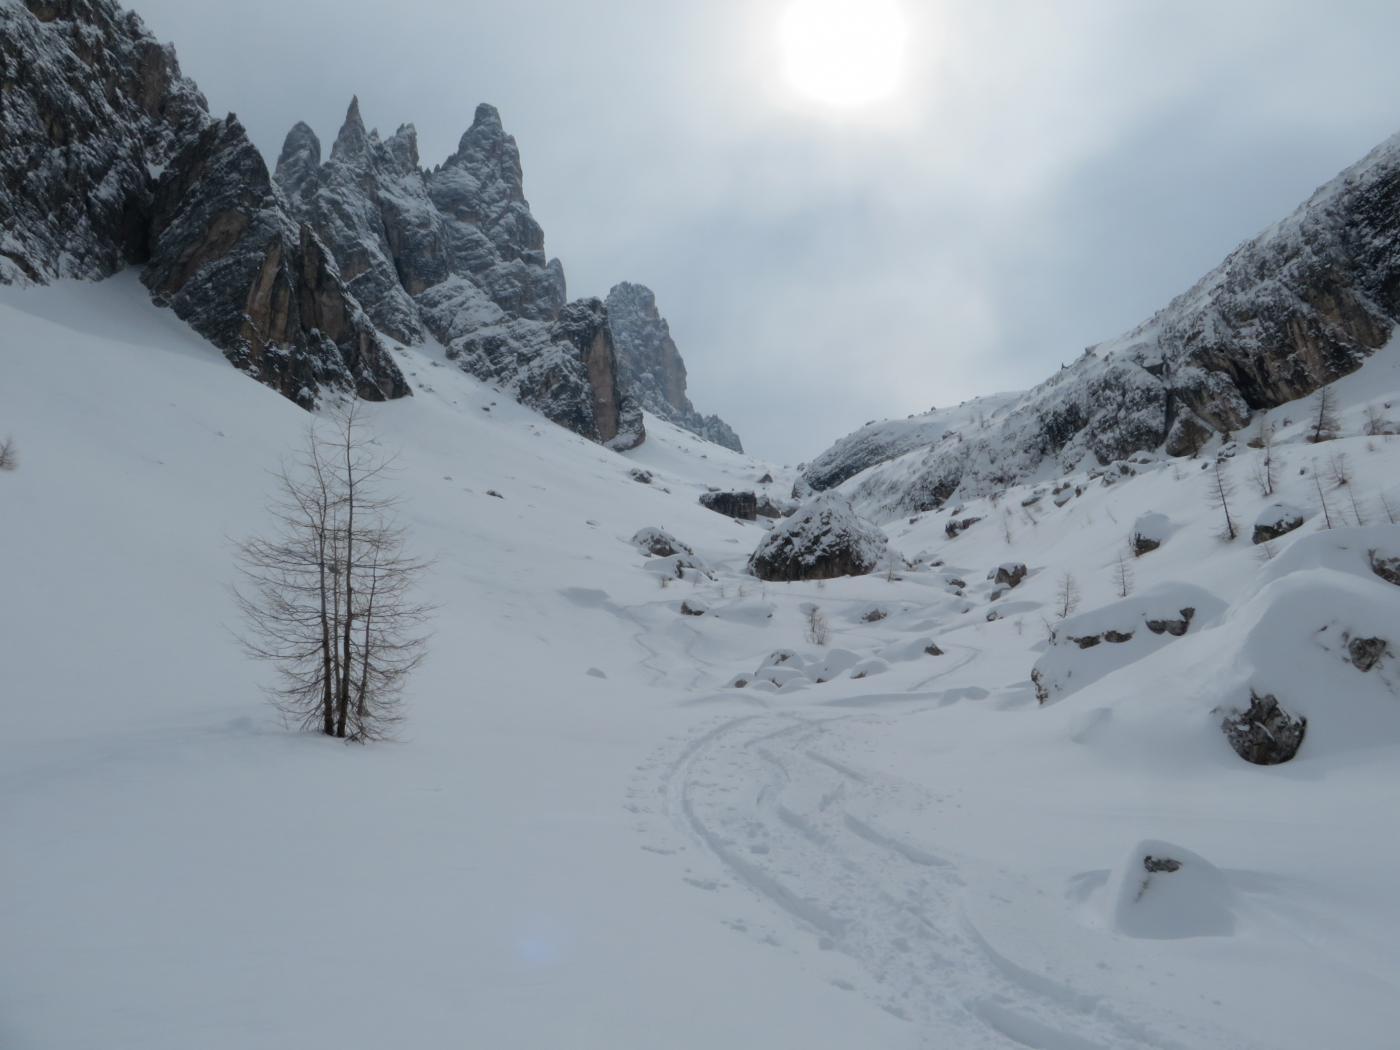 Formin (Monte) da Peziè de Parù e la Val Formin 2015-03-17